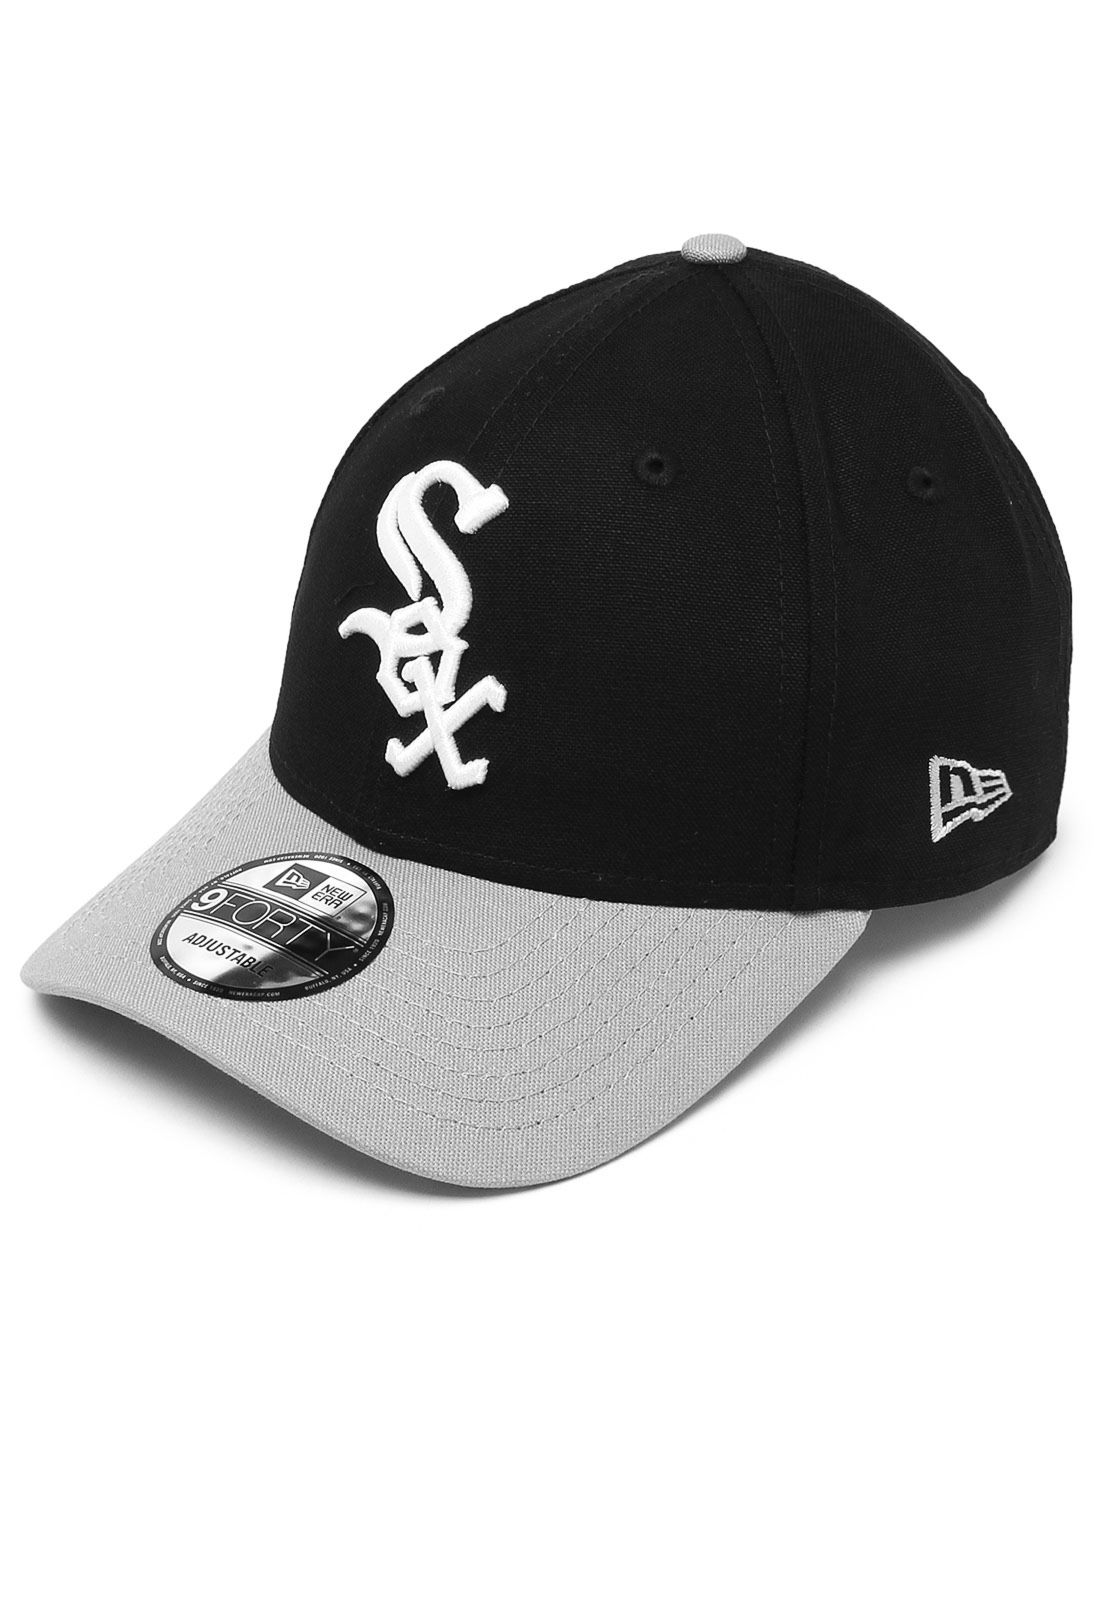 Boné New Era Snapback 940 Chicago White Sox Preto Cinza  5aad25401b4